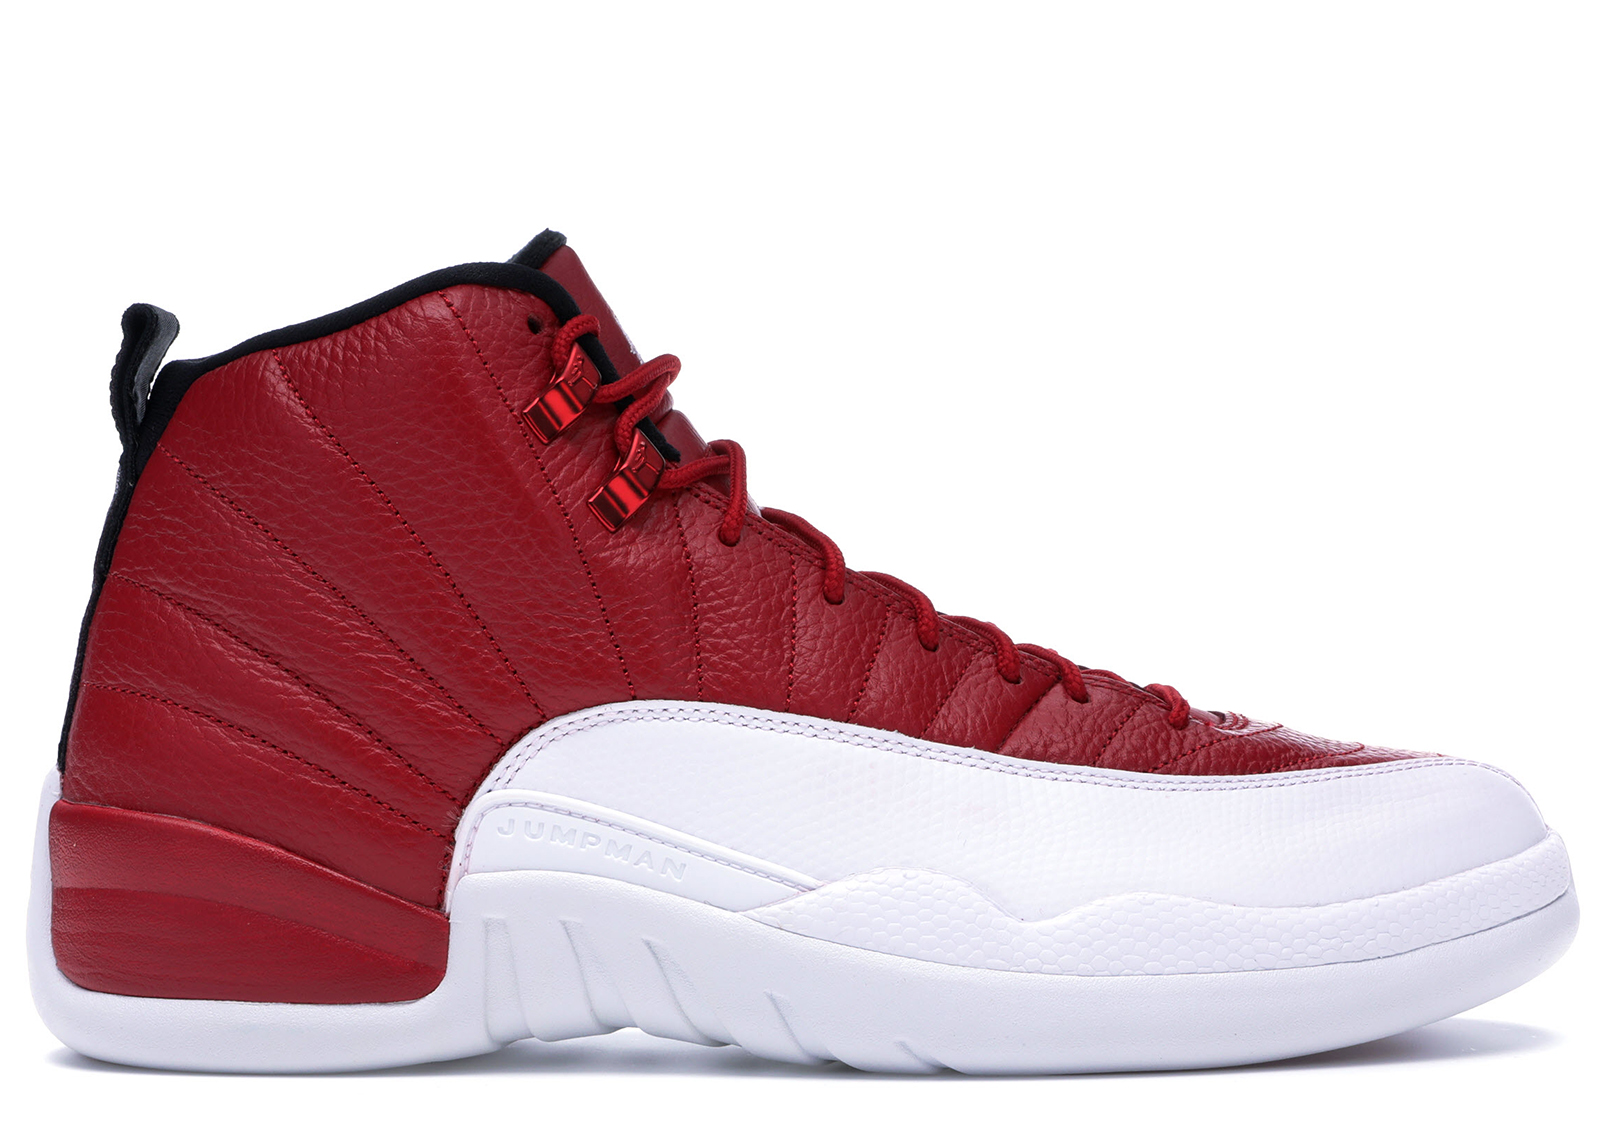 Jordan 12 Retro Gym Red - 130690-600